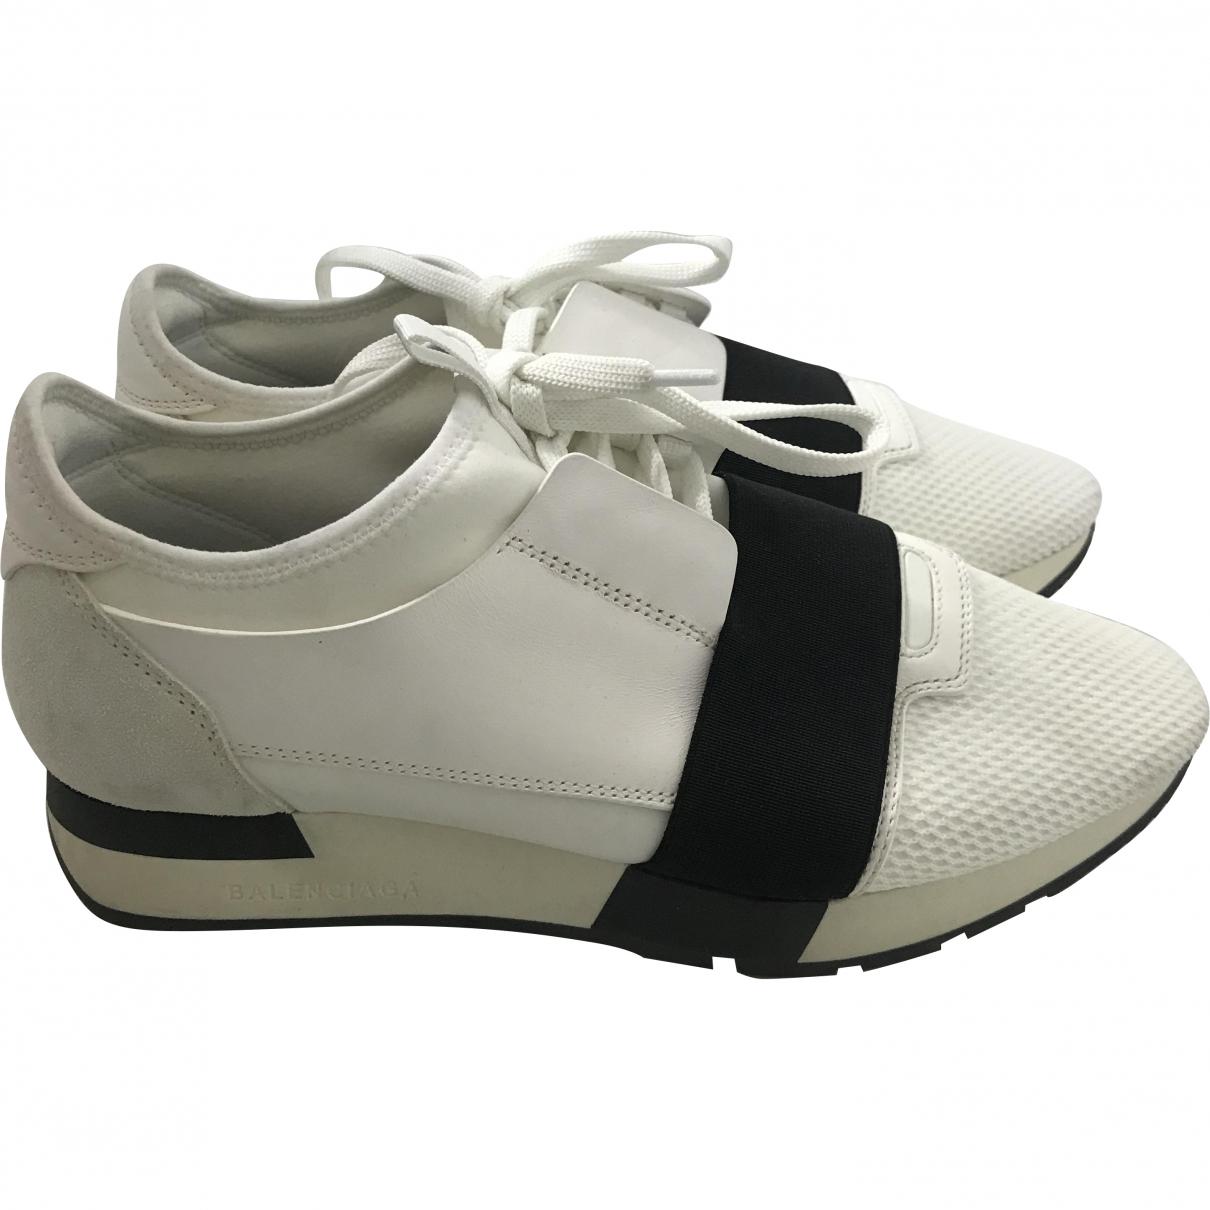 Balenciaga Race White Leather Trainers for Women 39 EU